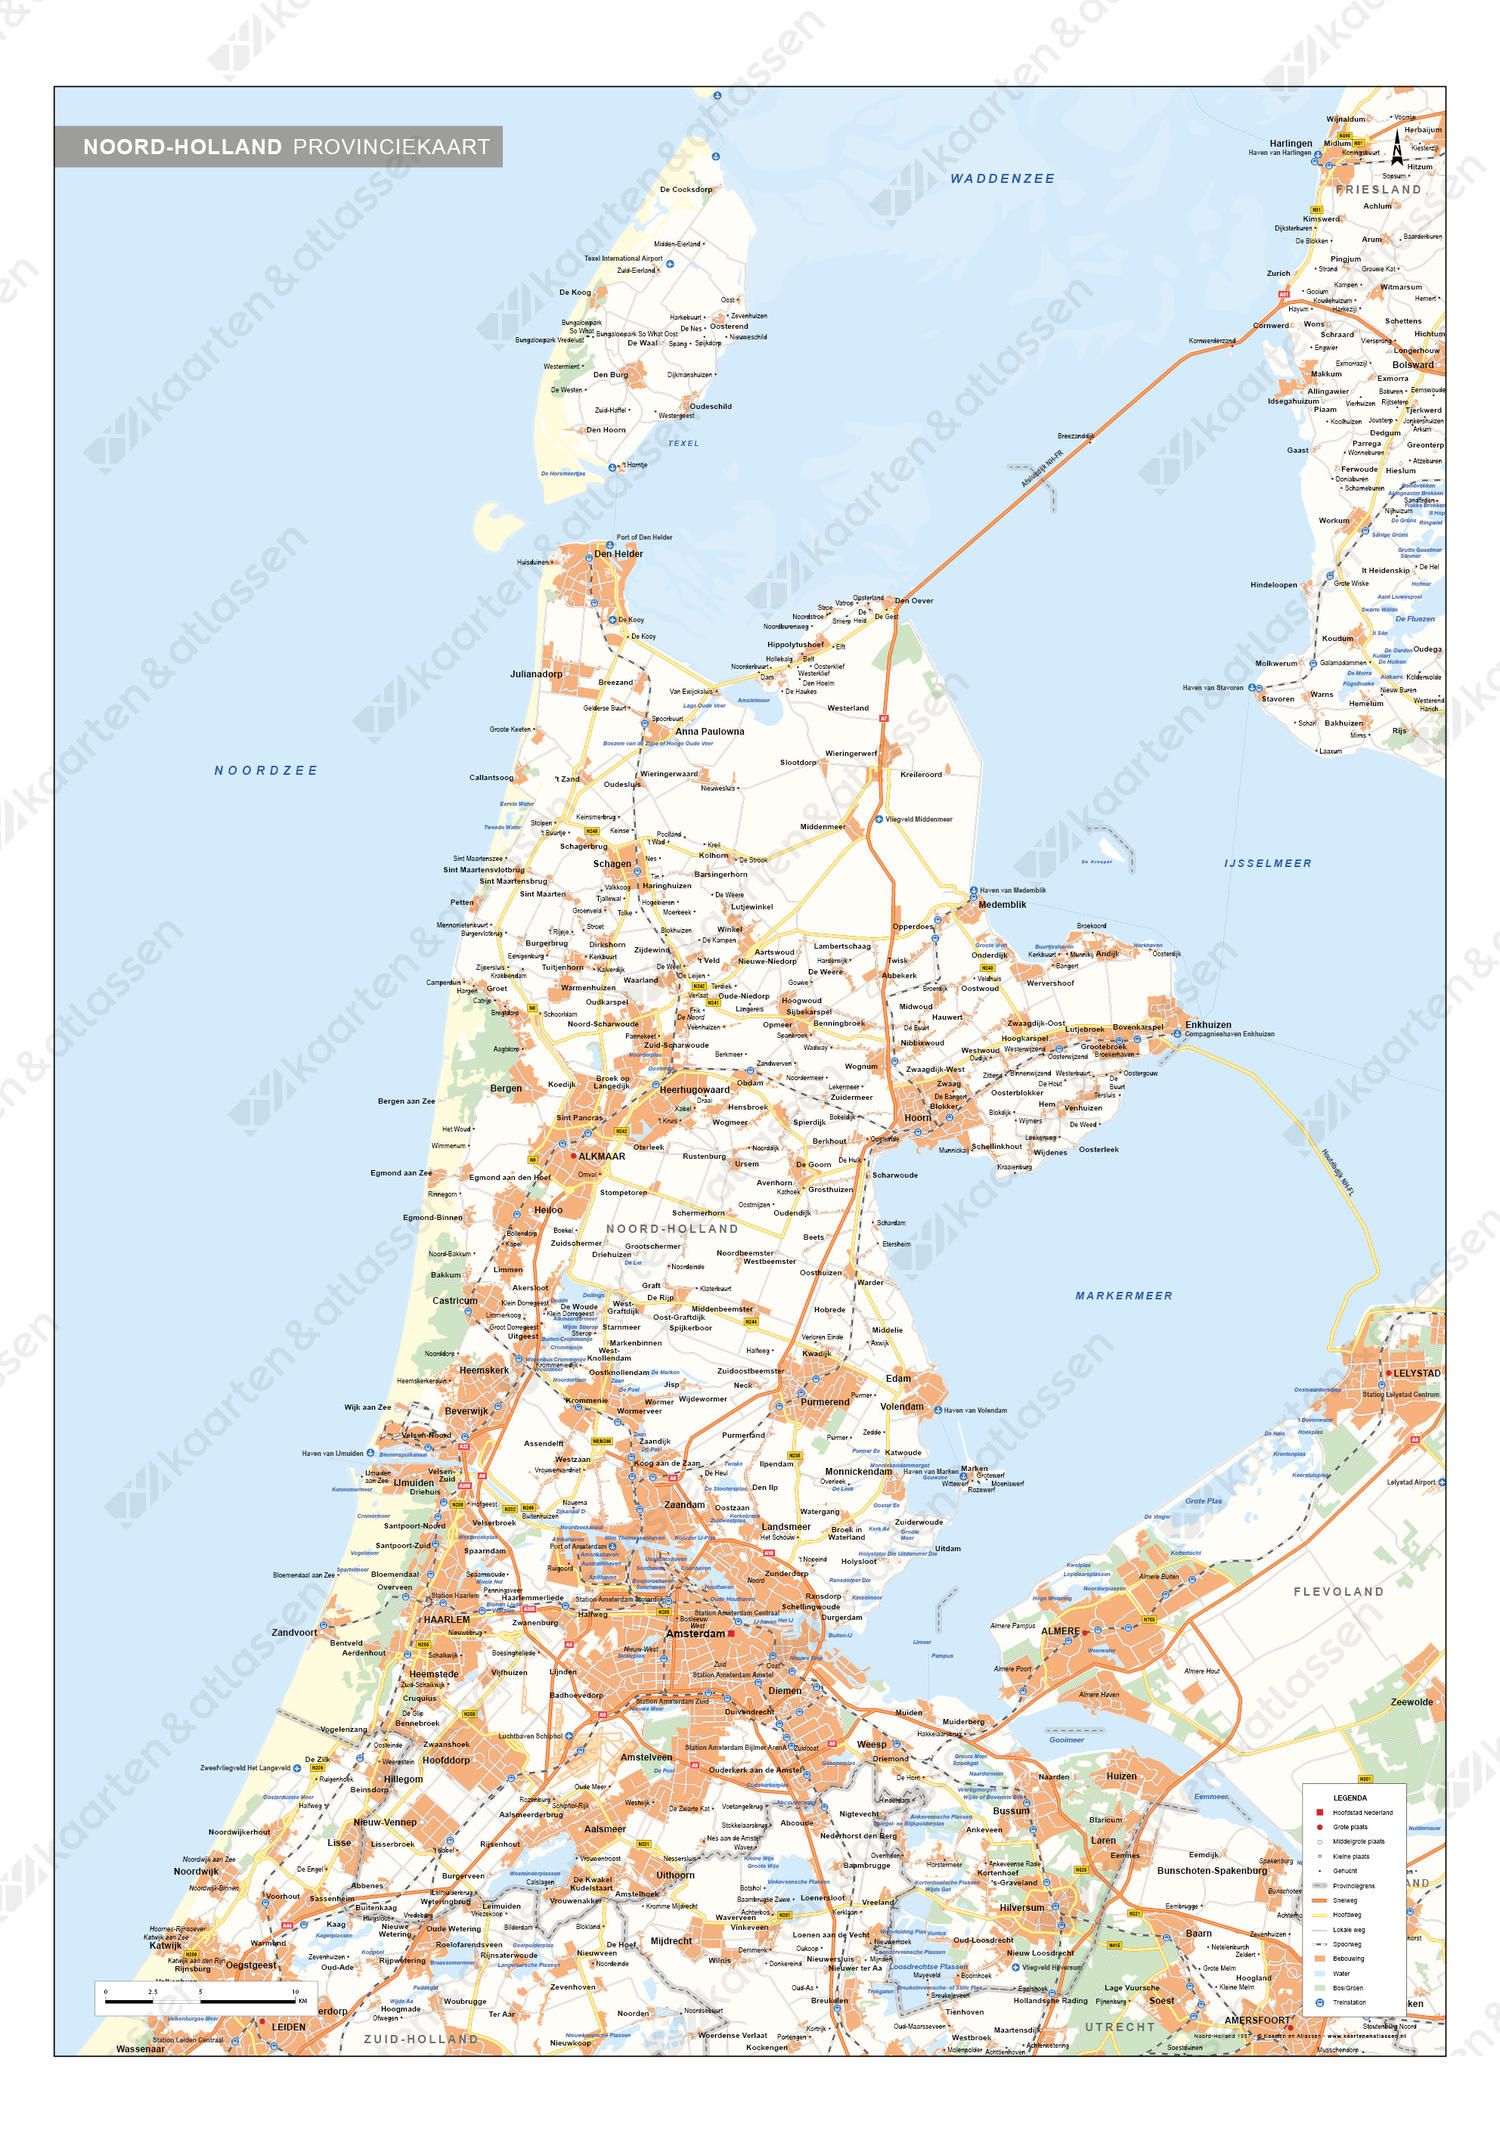 Noord-Holland Digitale Provinciekaart Staatkundig